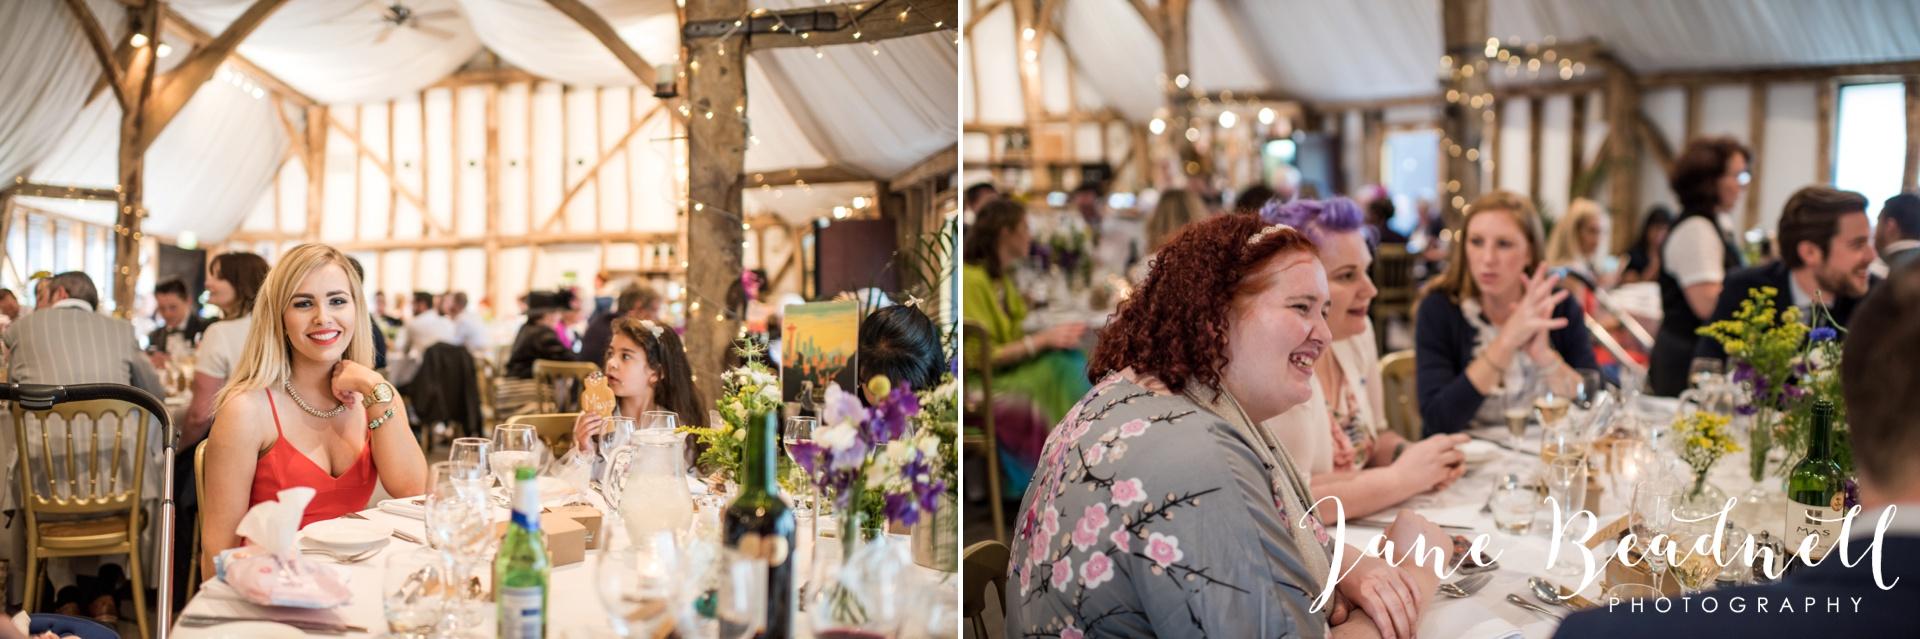 South Farm Wedding photography Hertfordshire by Jane Beadnell Photography fine art wedding photographer_0180